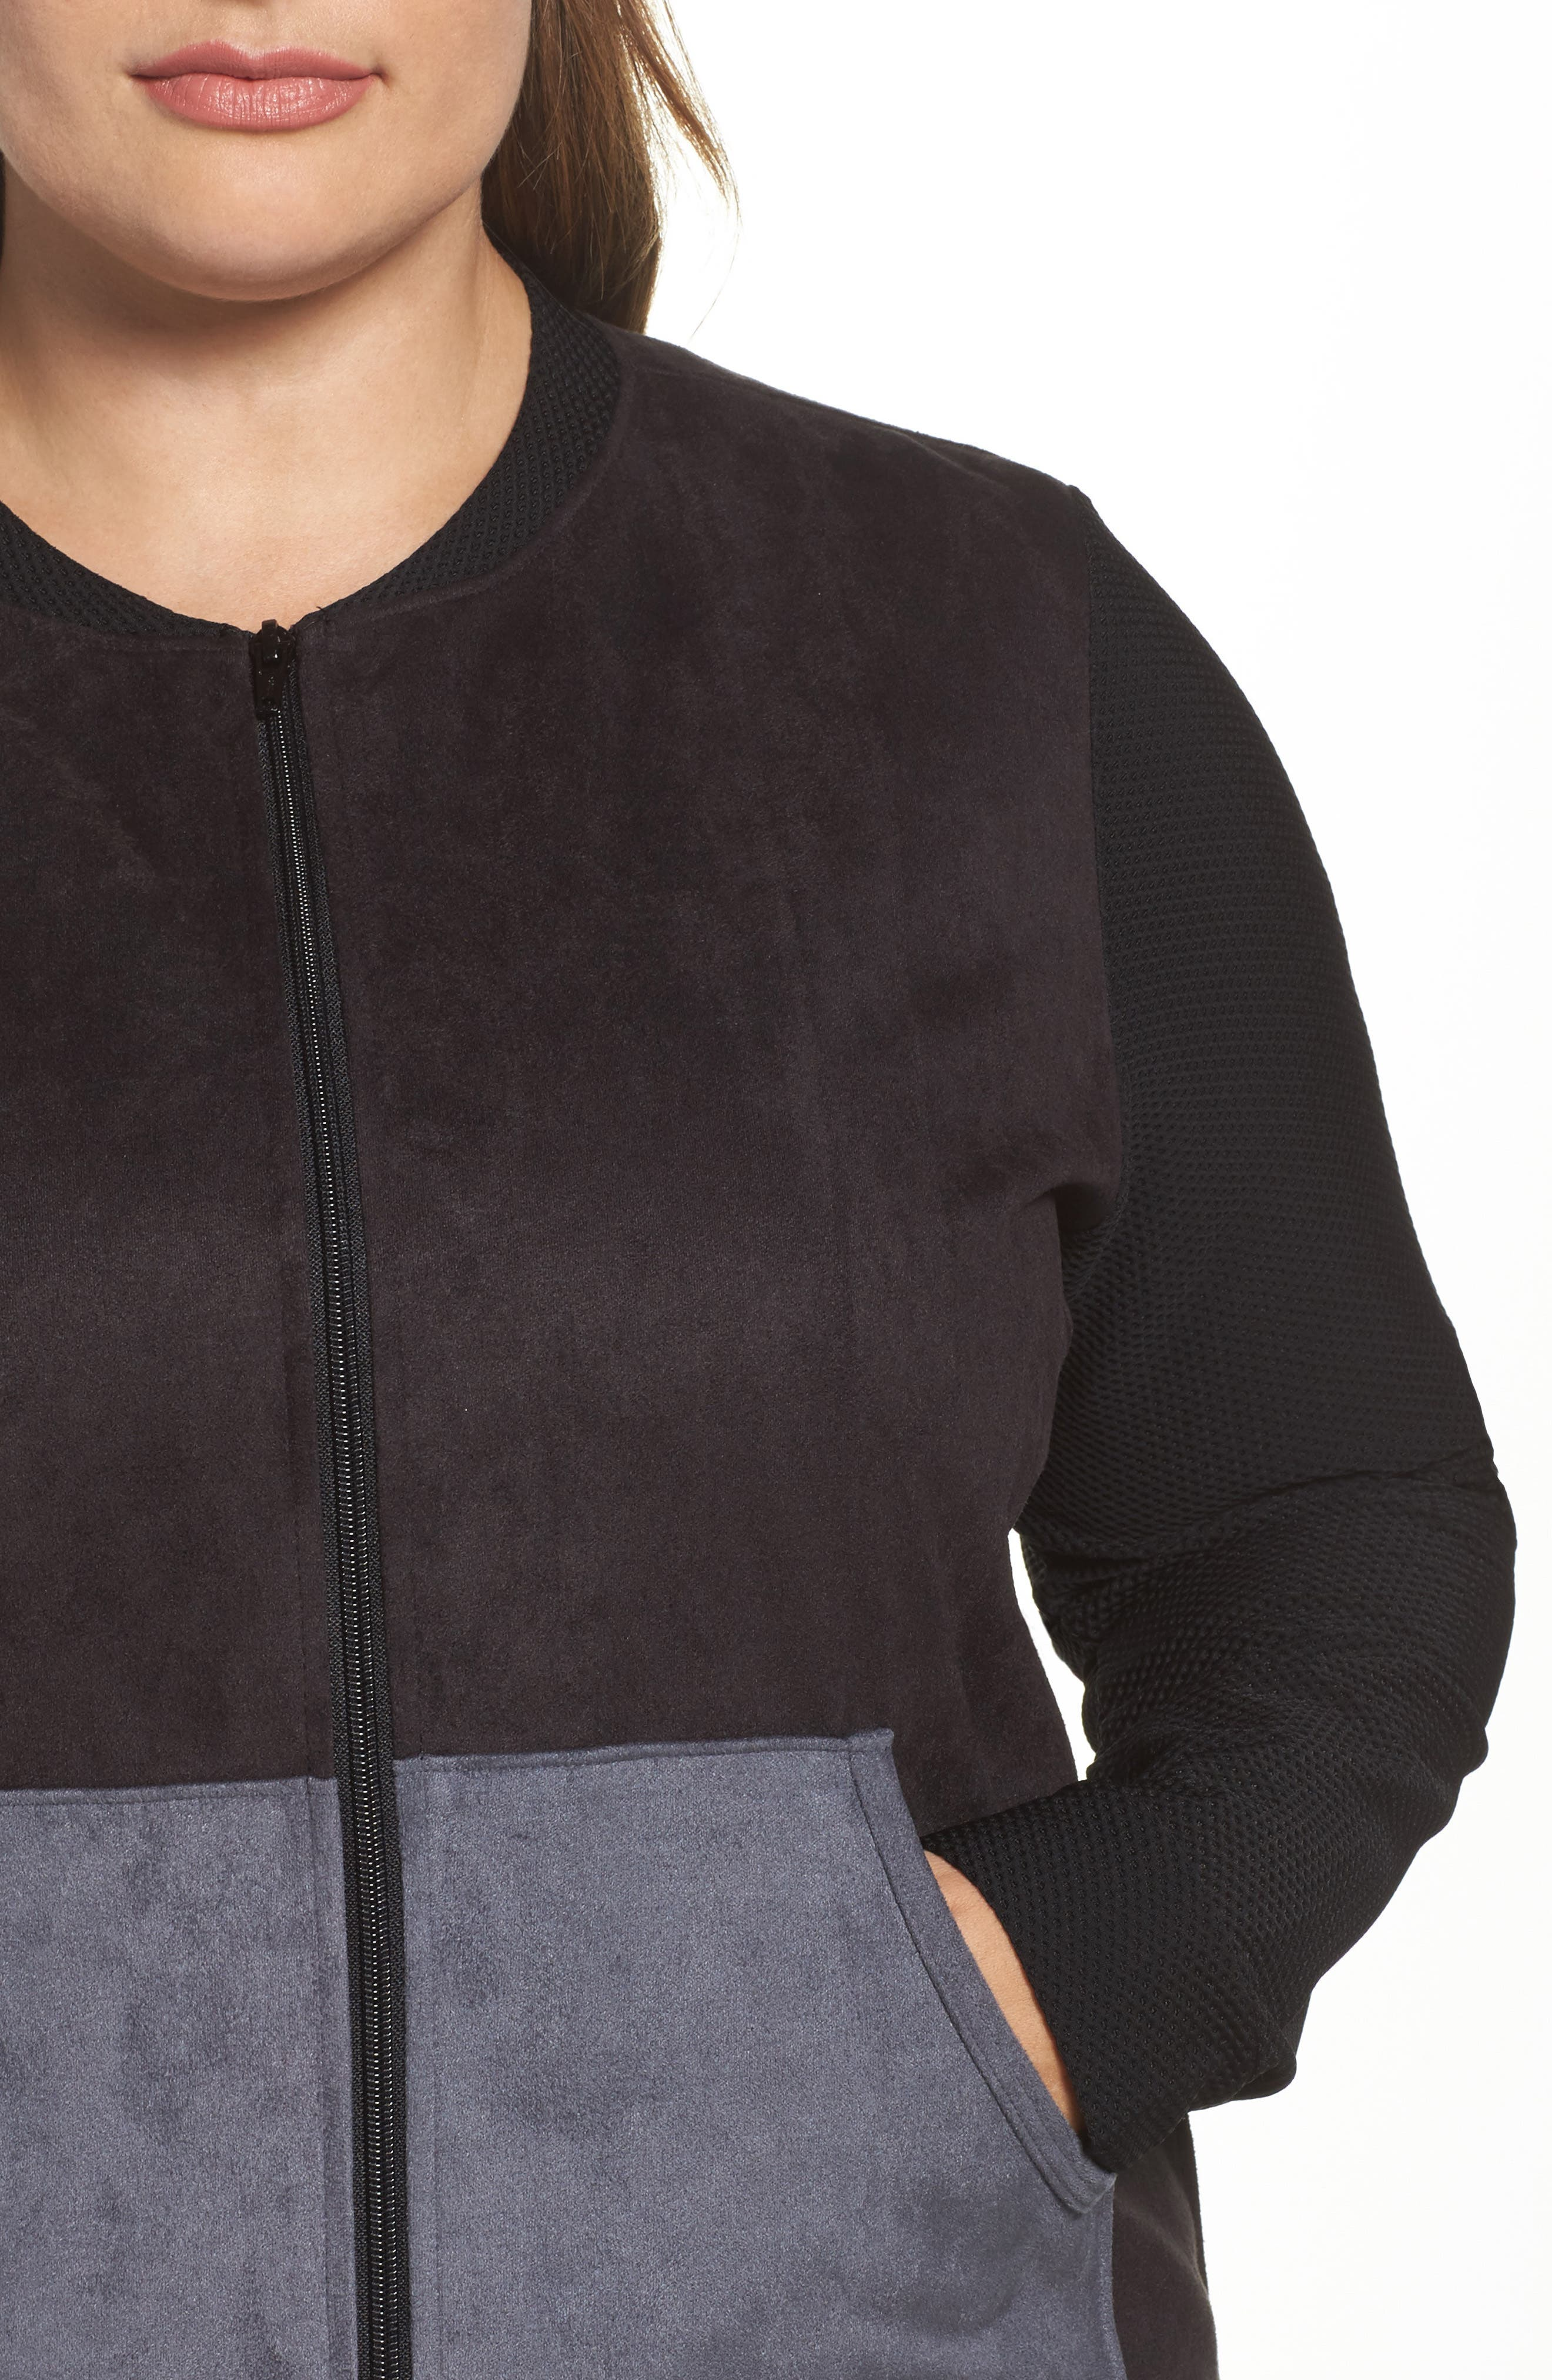 Track Jacket,                             Alternate thumbnail 5, color,                             Black/ Charcoal